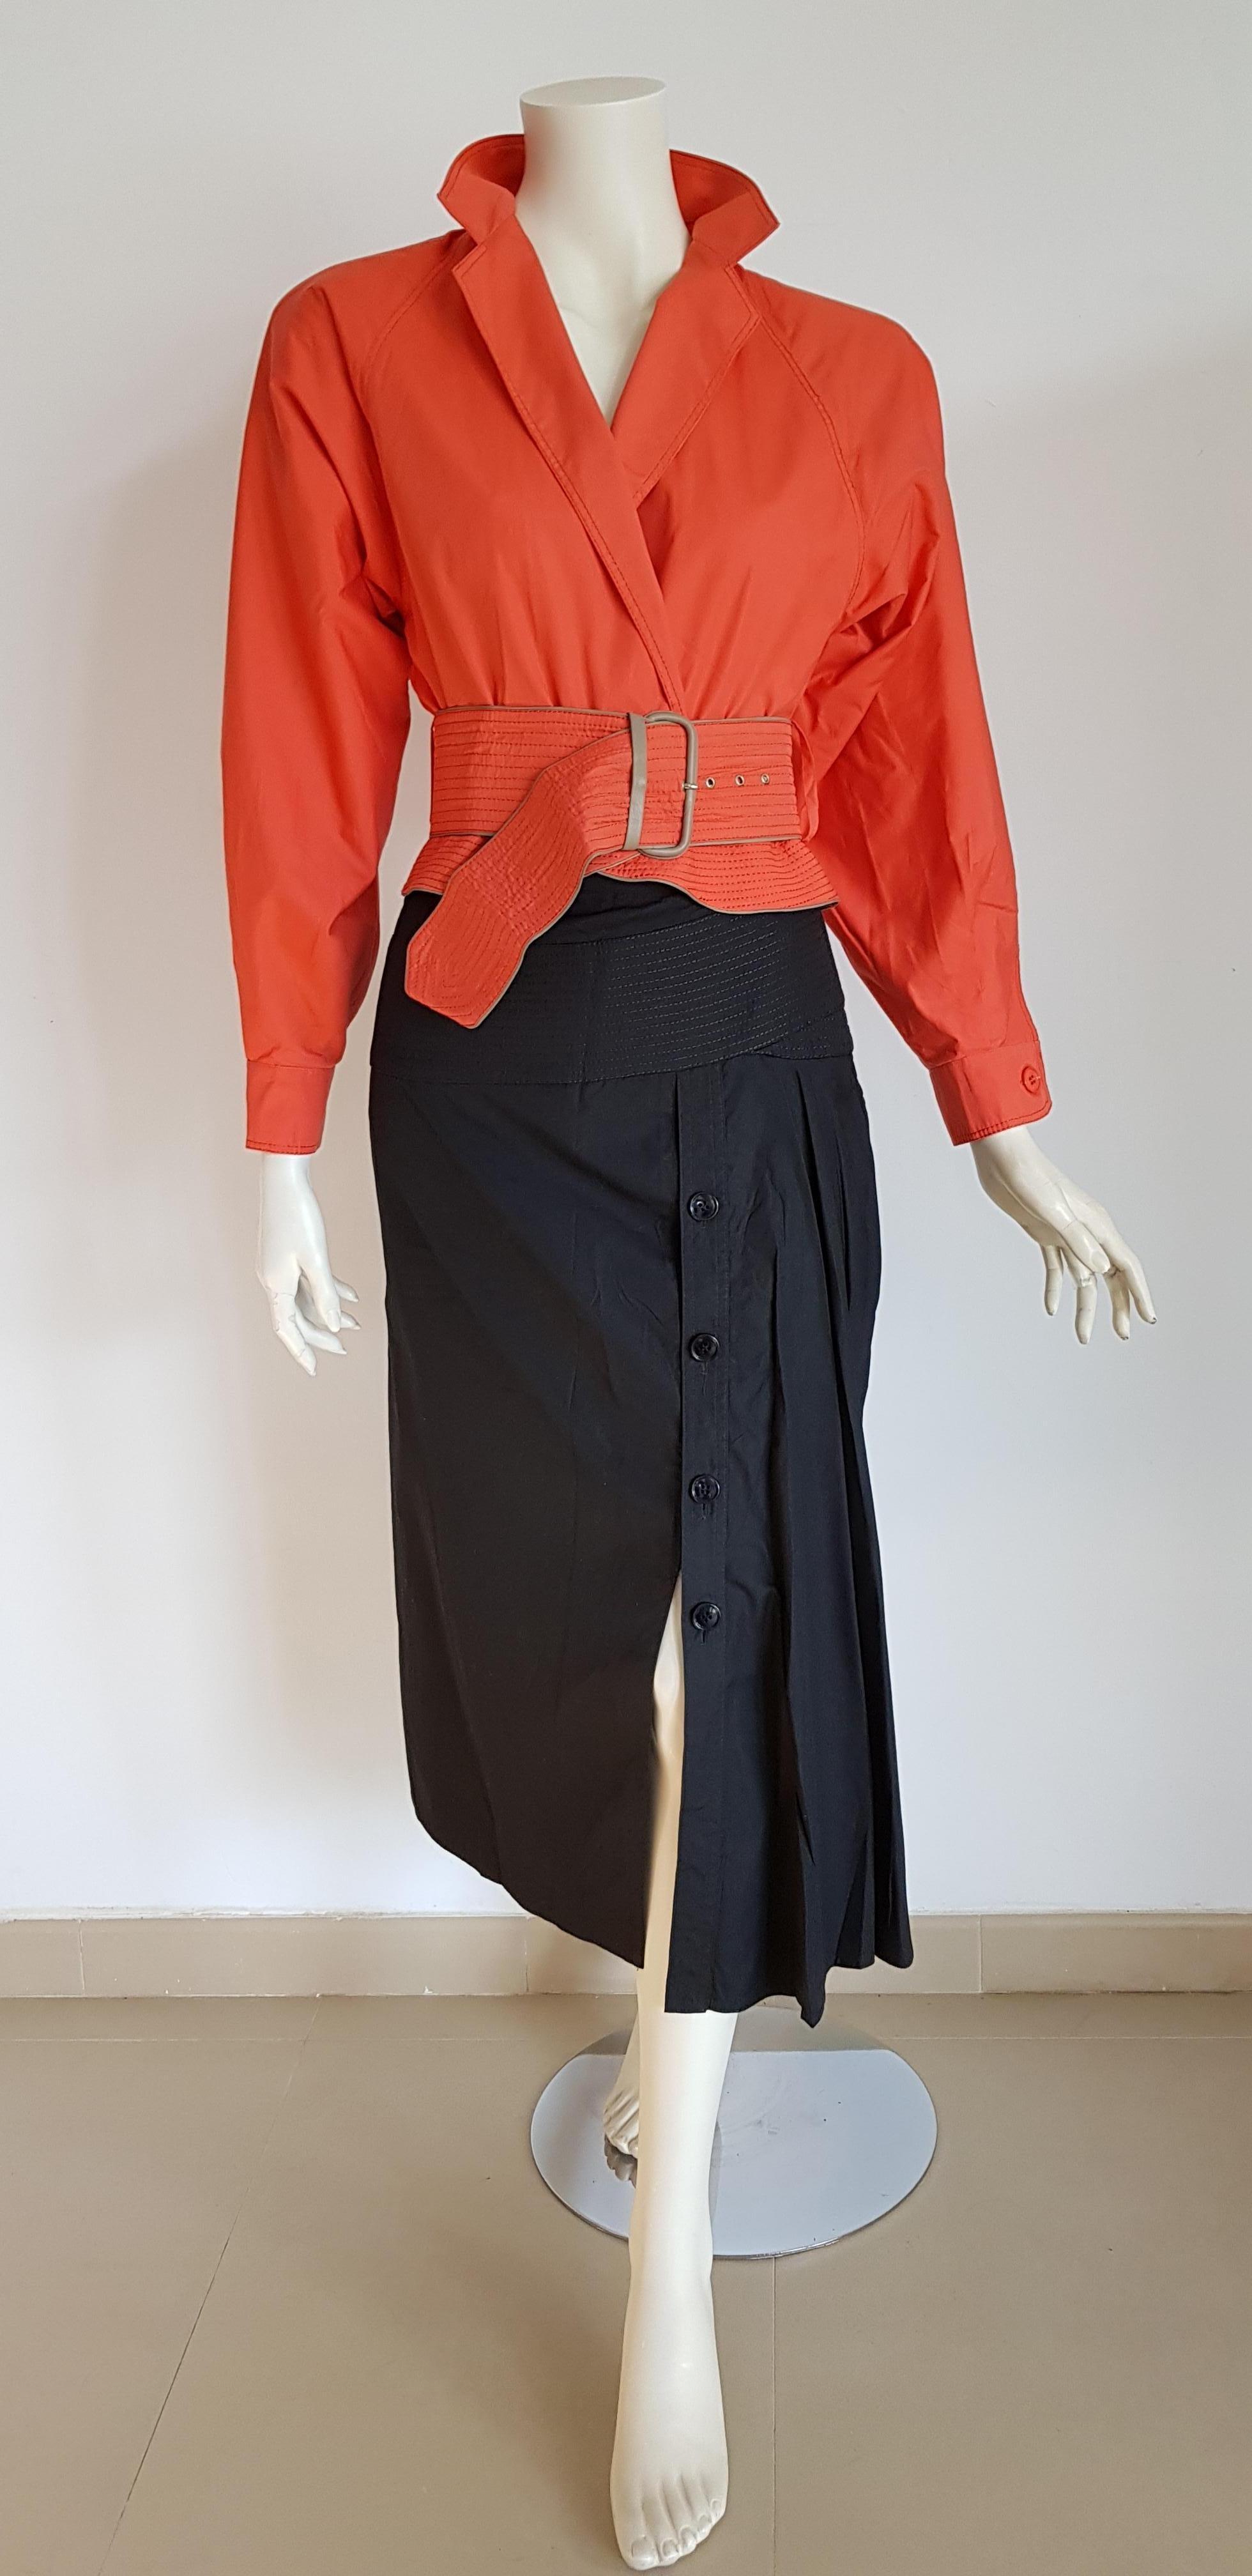 Gianfranco Ferre Single Piece Red Salmon Shirt Black Skirt Ensemble